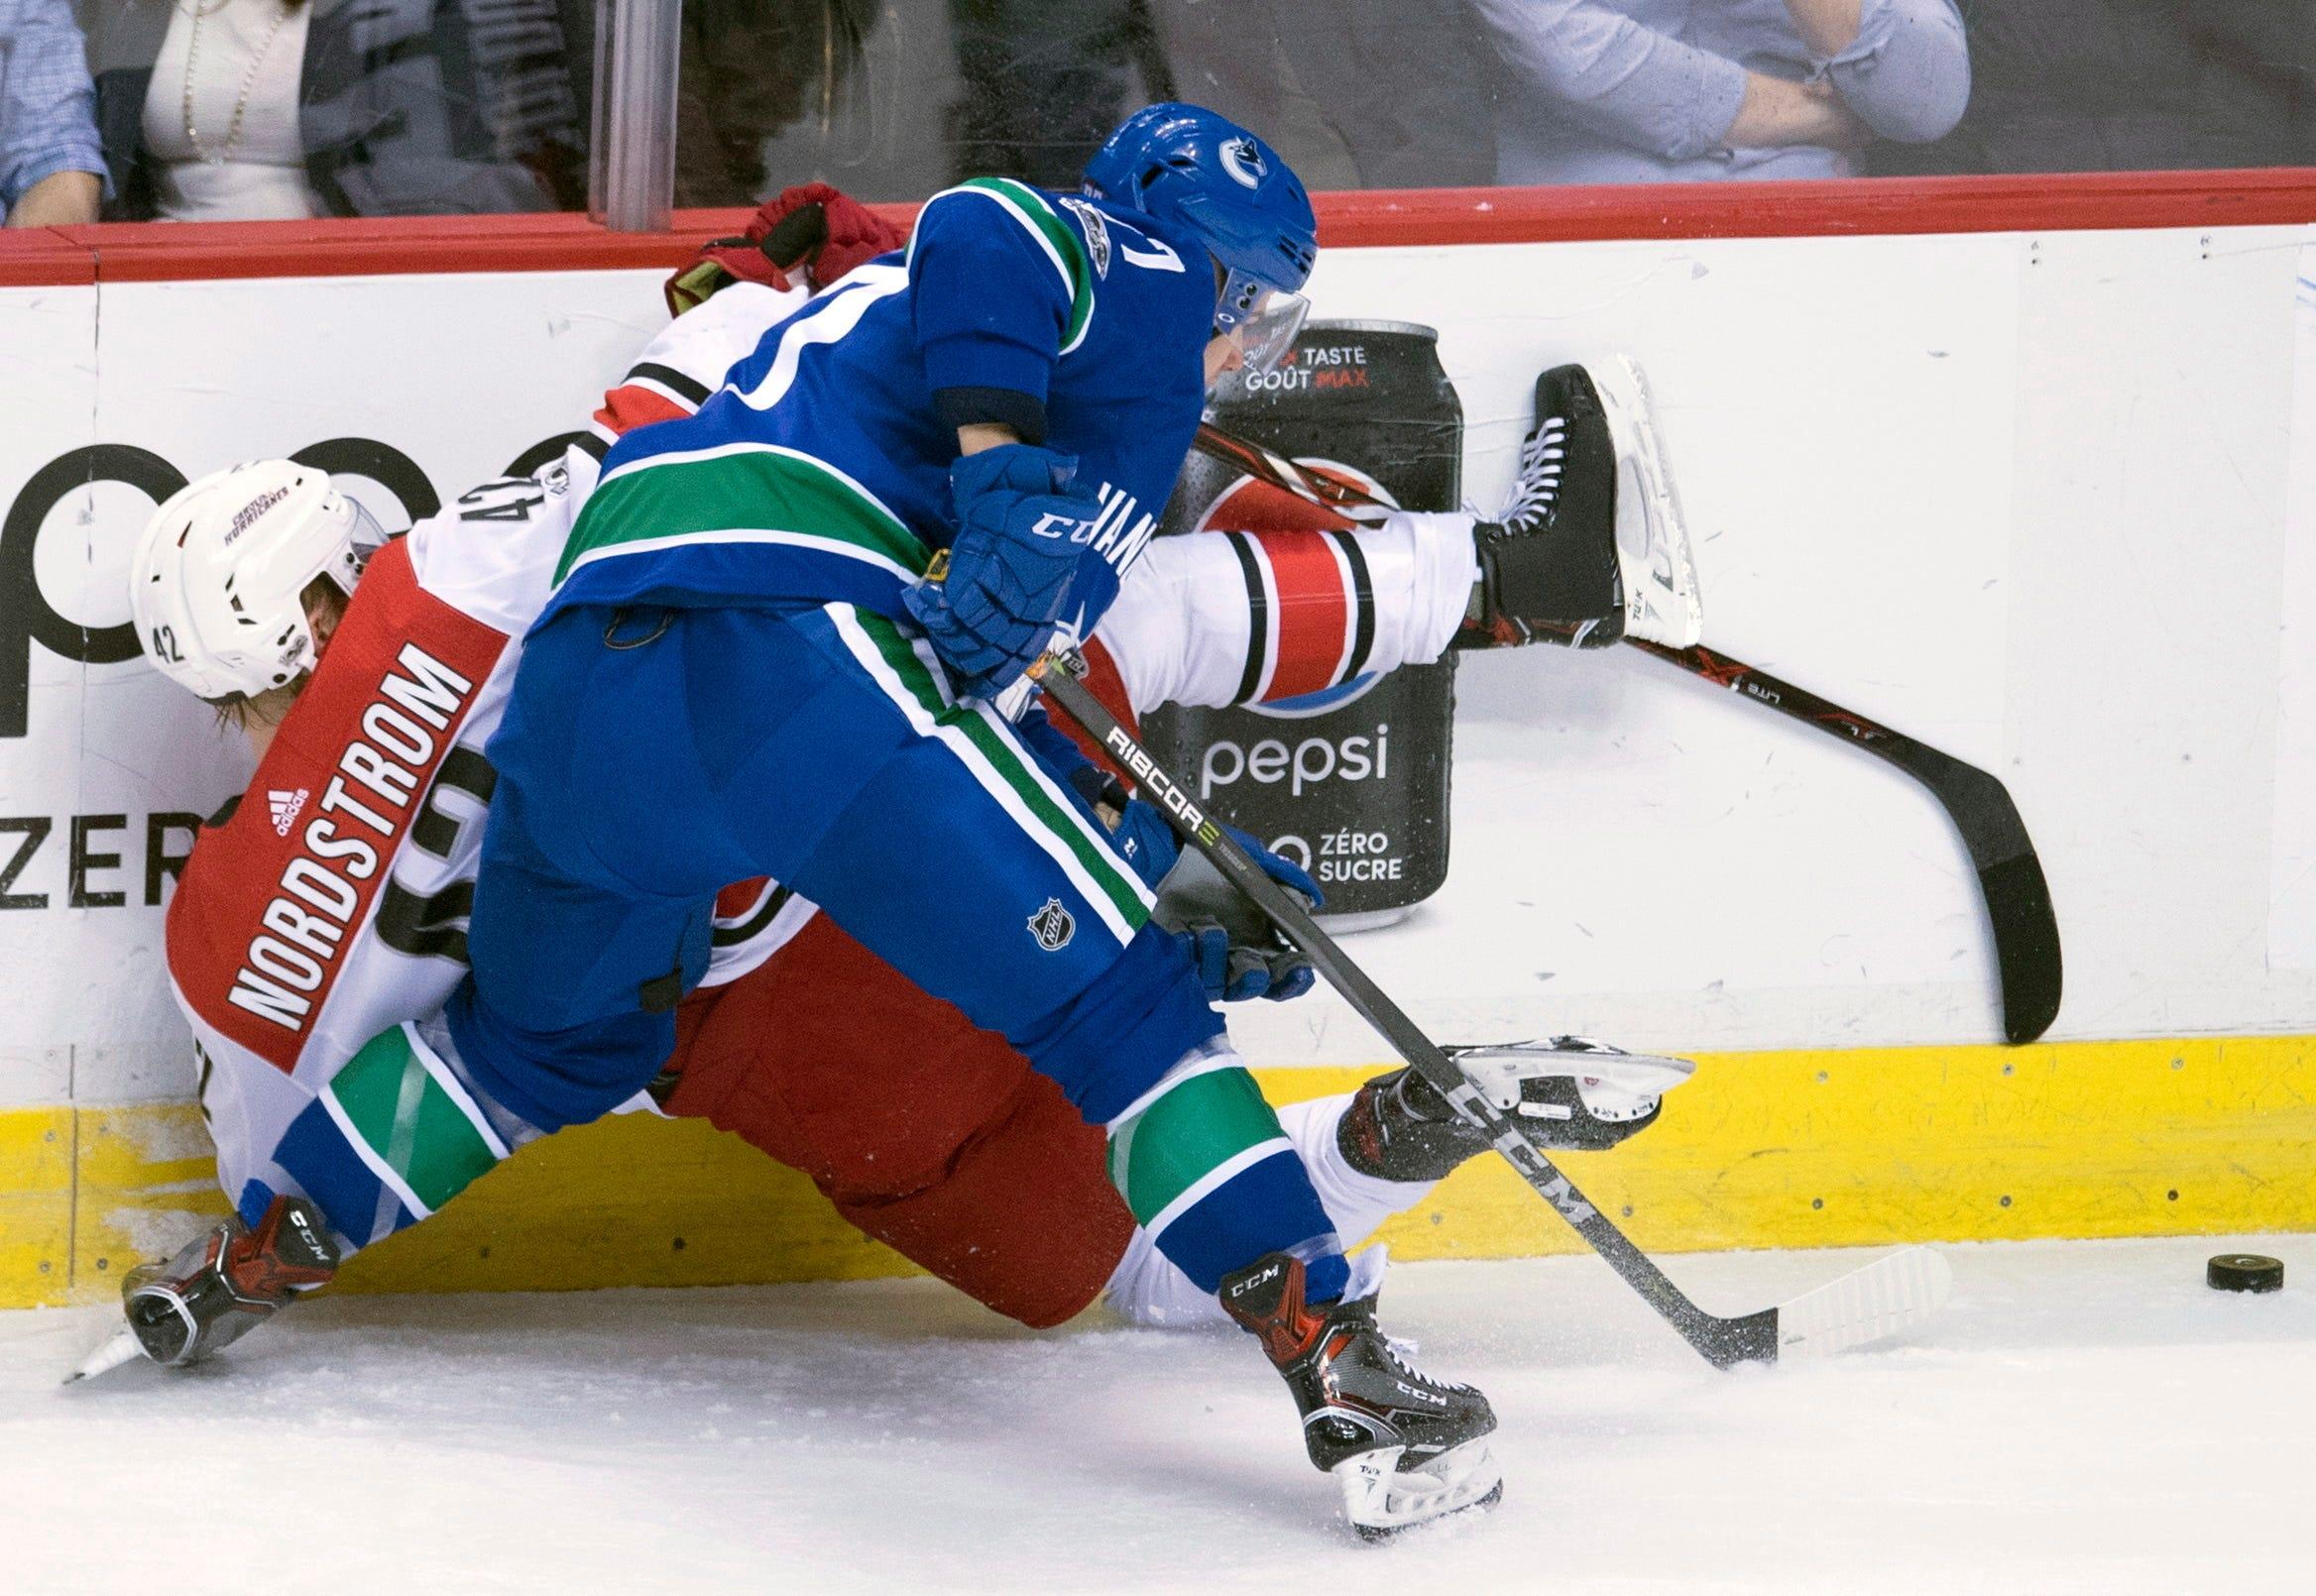 Markstrom gets 1st NHL shutout, Canucks blank Hurricanes 3-0